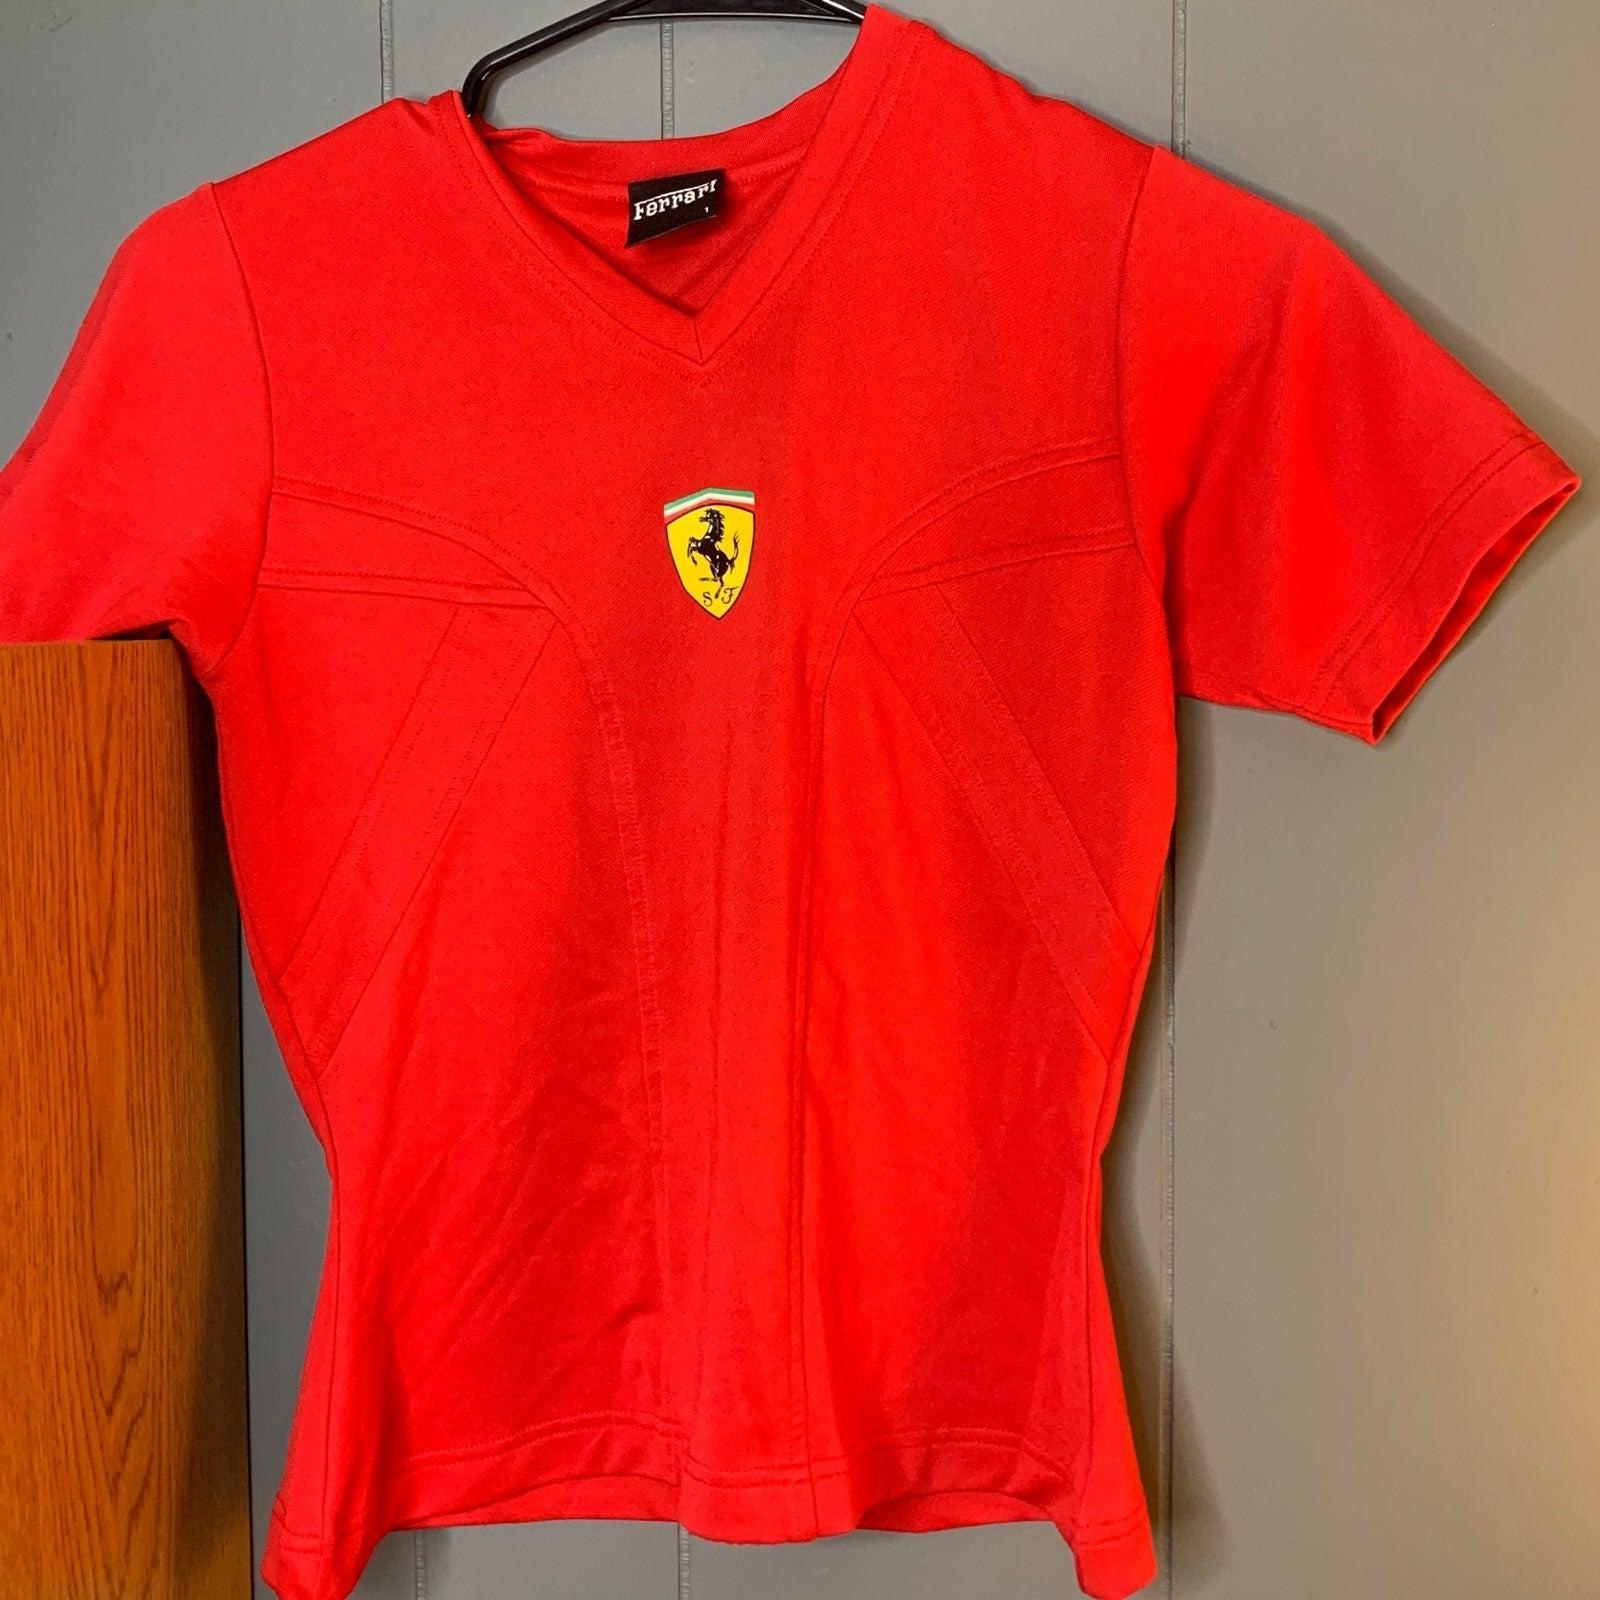 Size Small Women's Ferrari Sports Shirt